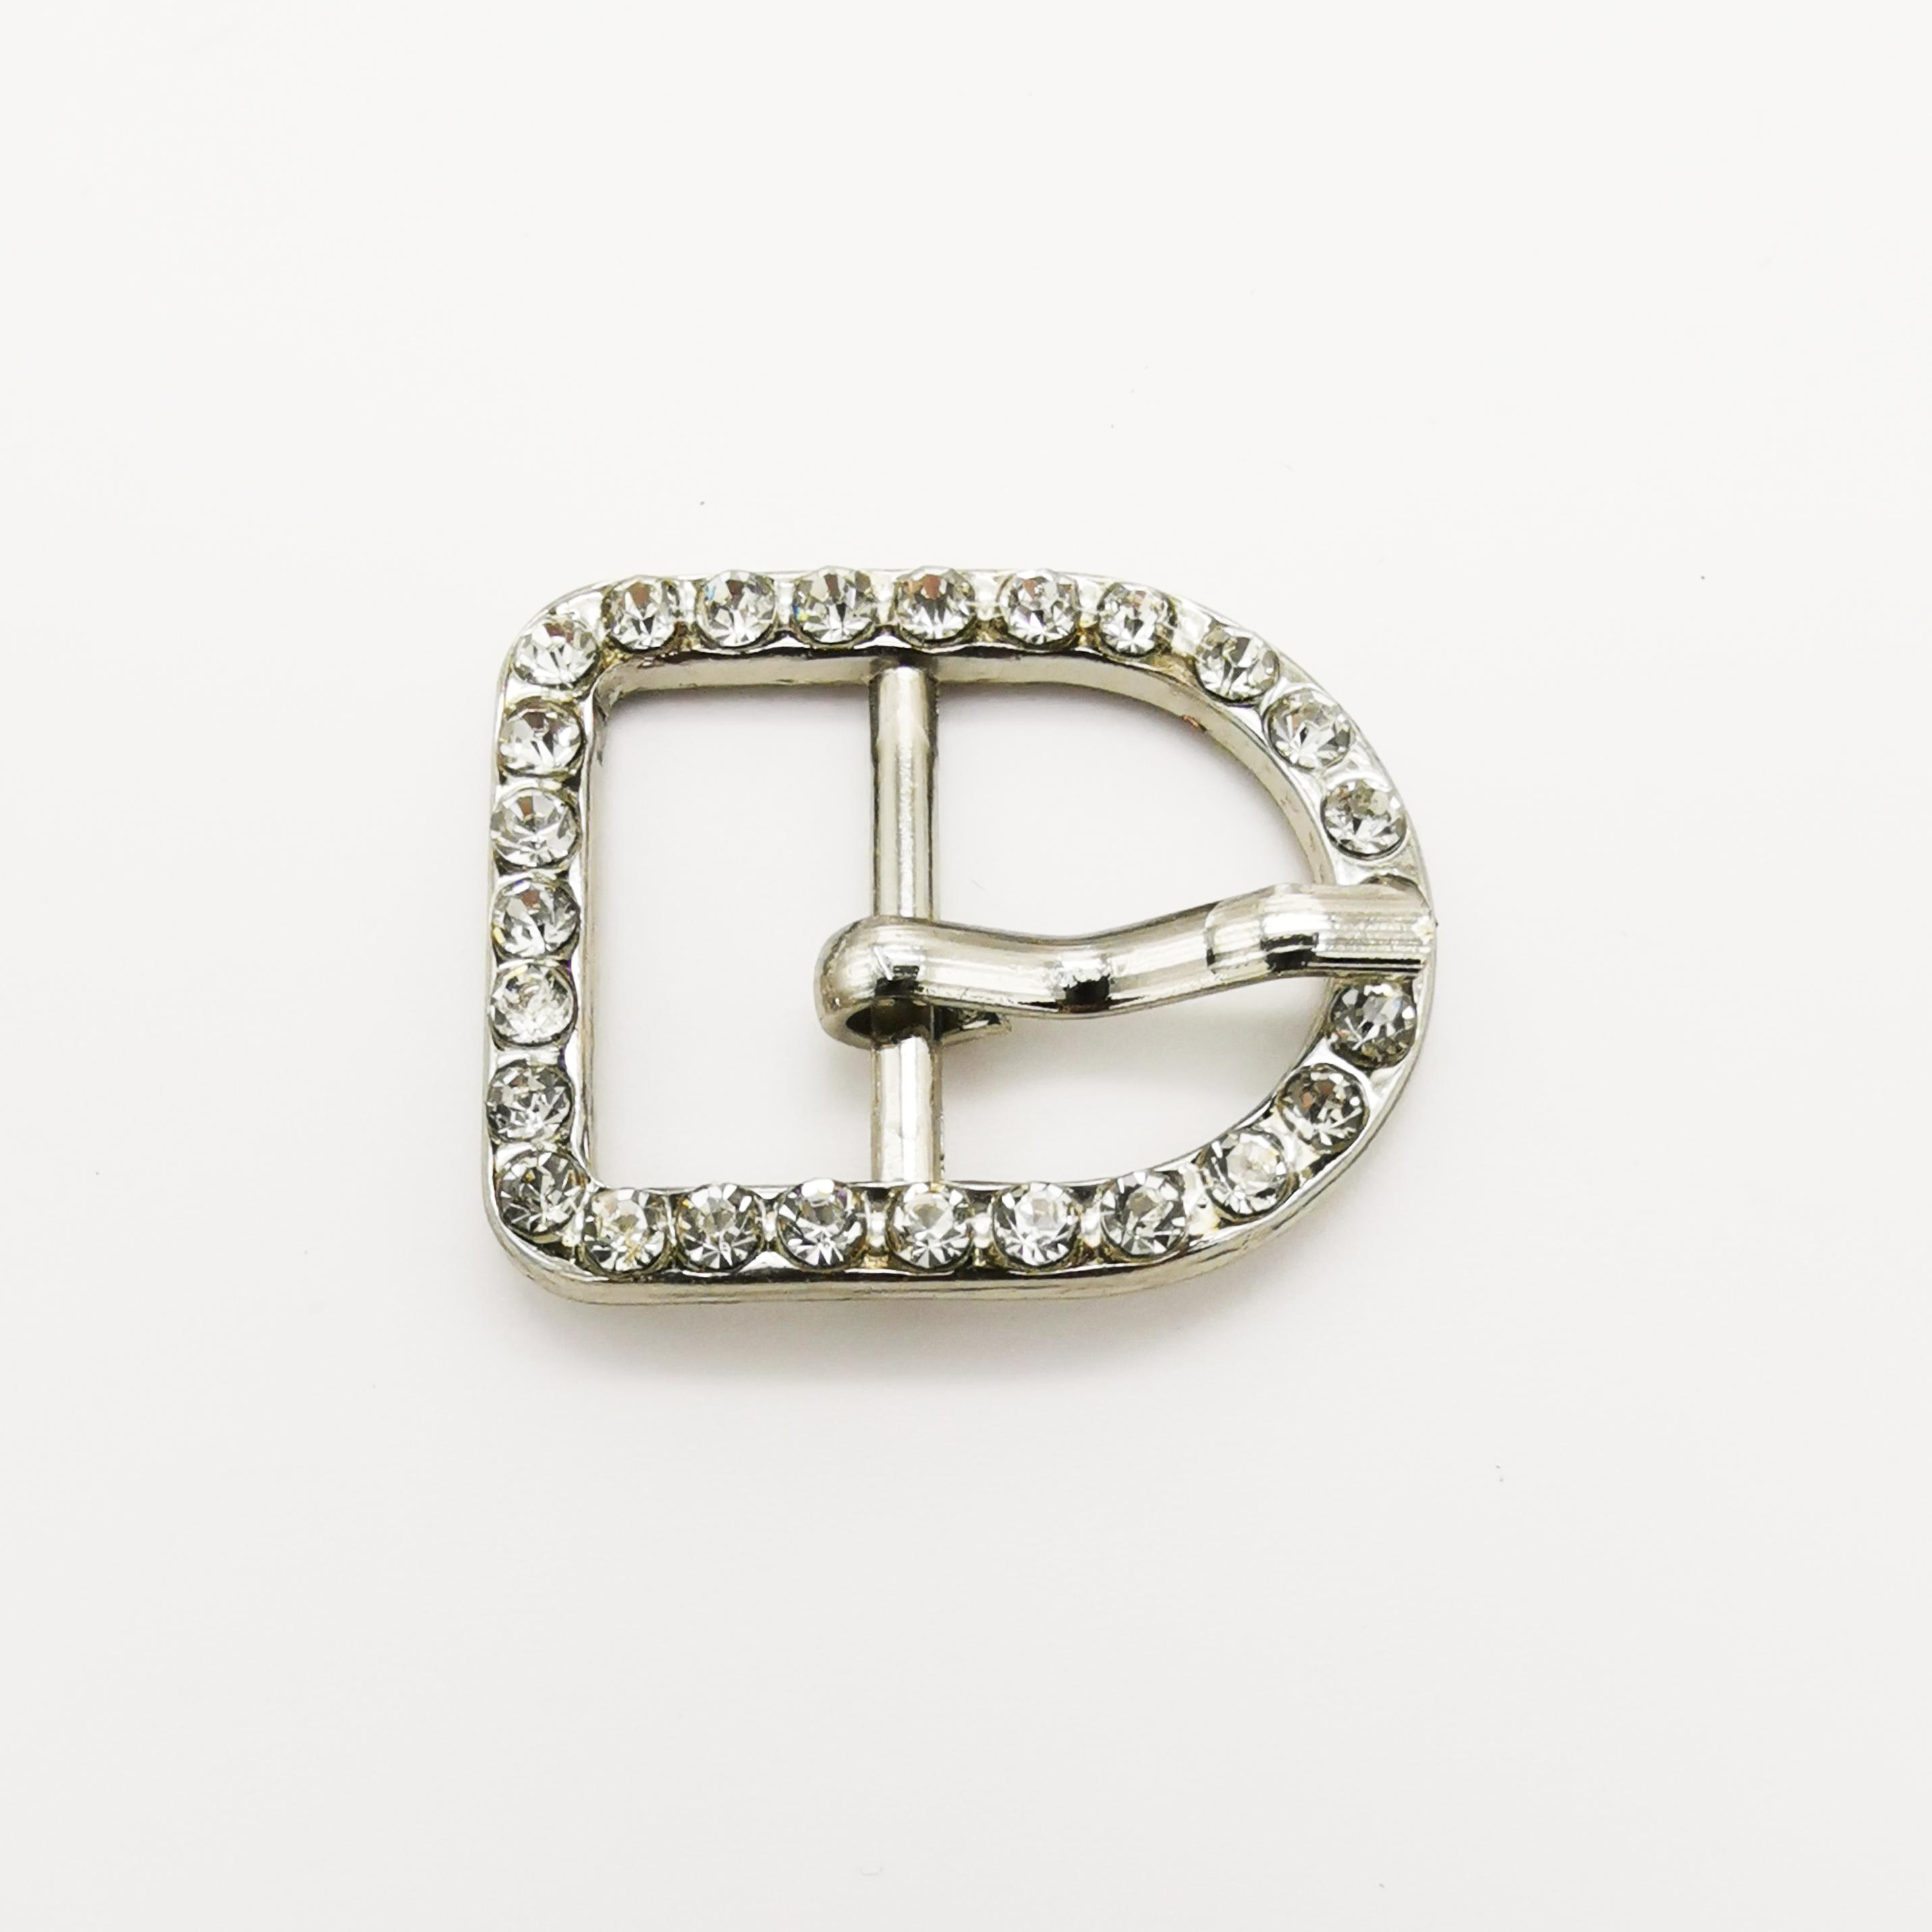 decorative  shoe buckles accessories components